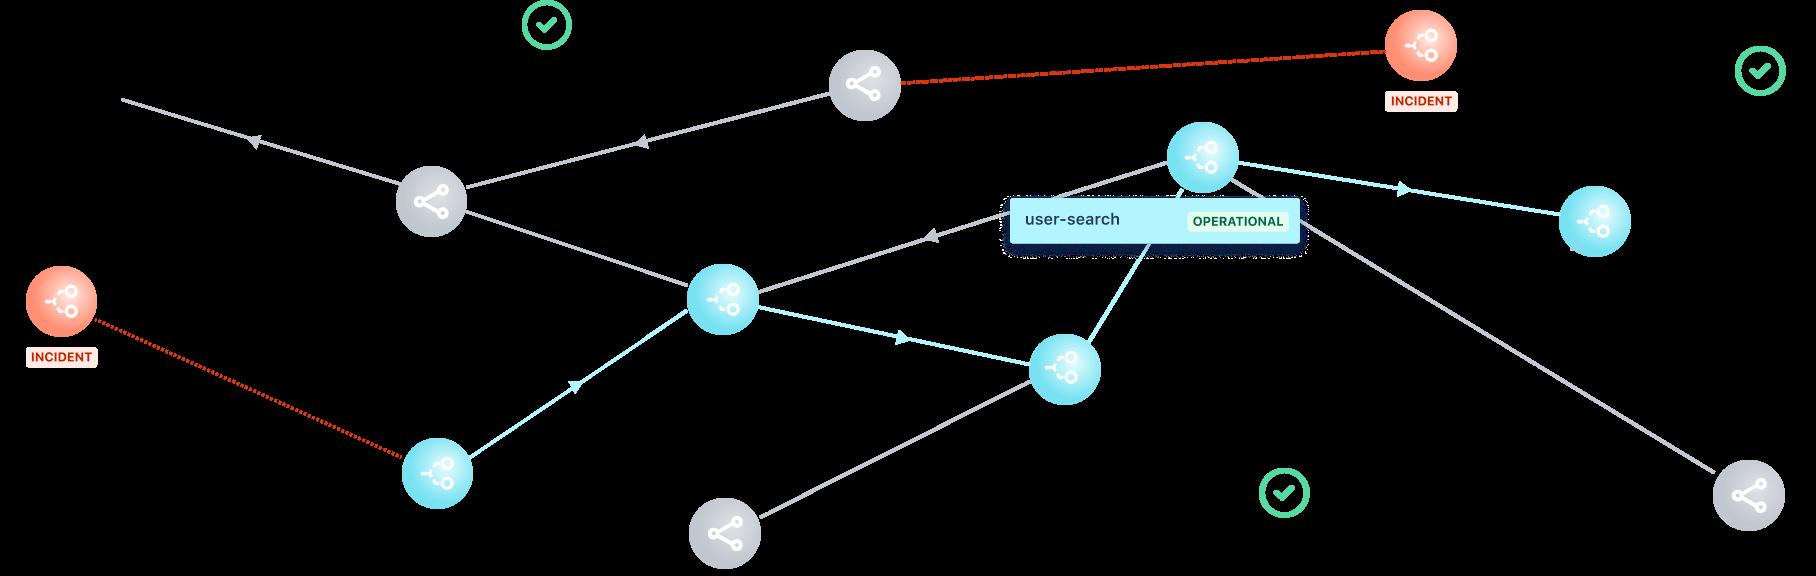 Dependencies illustration